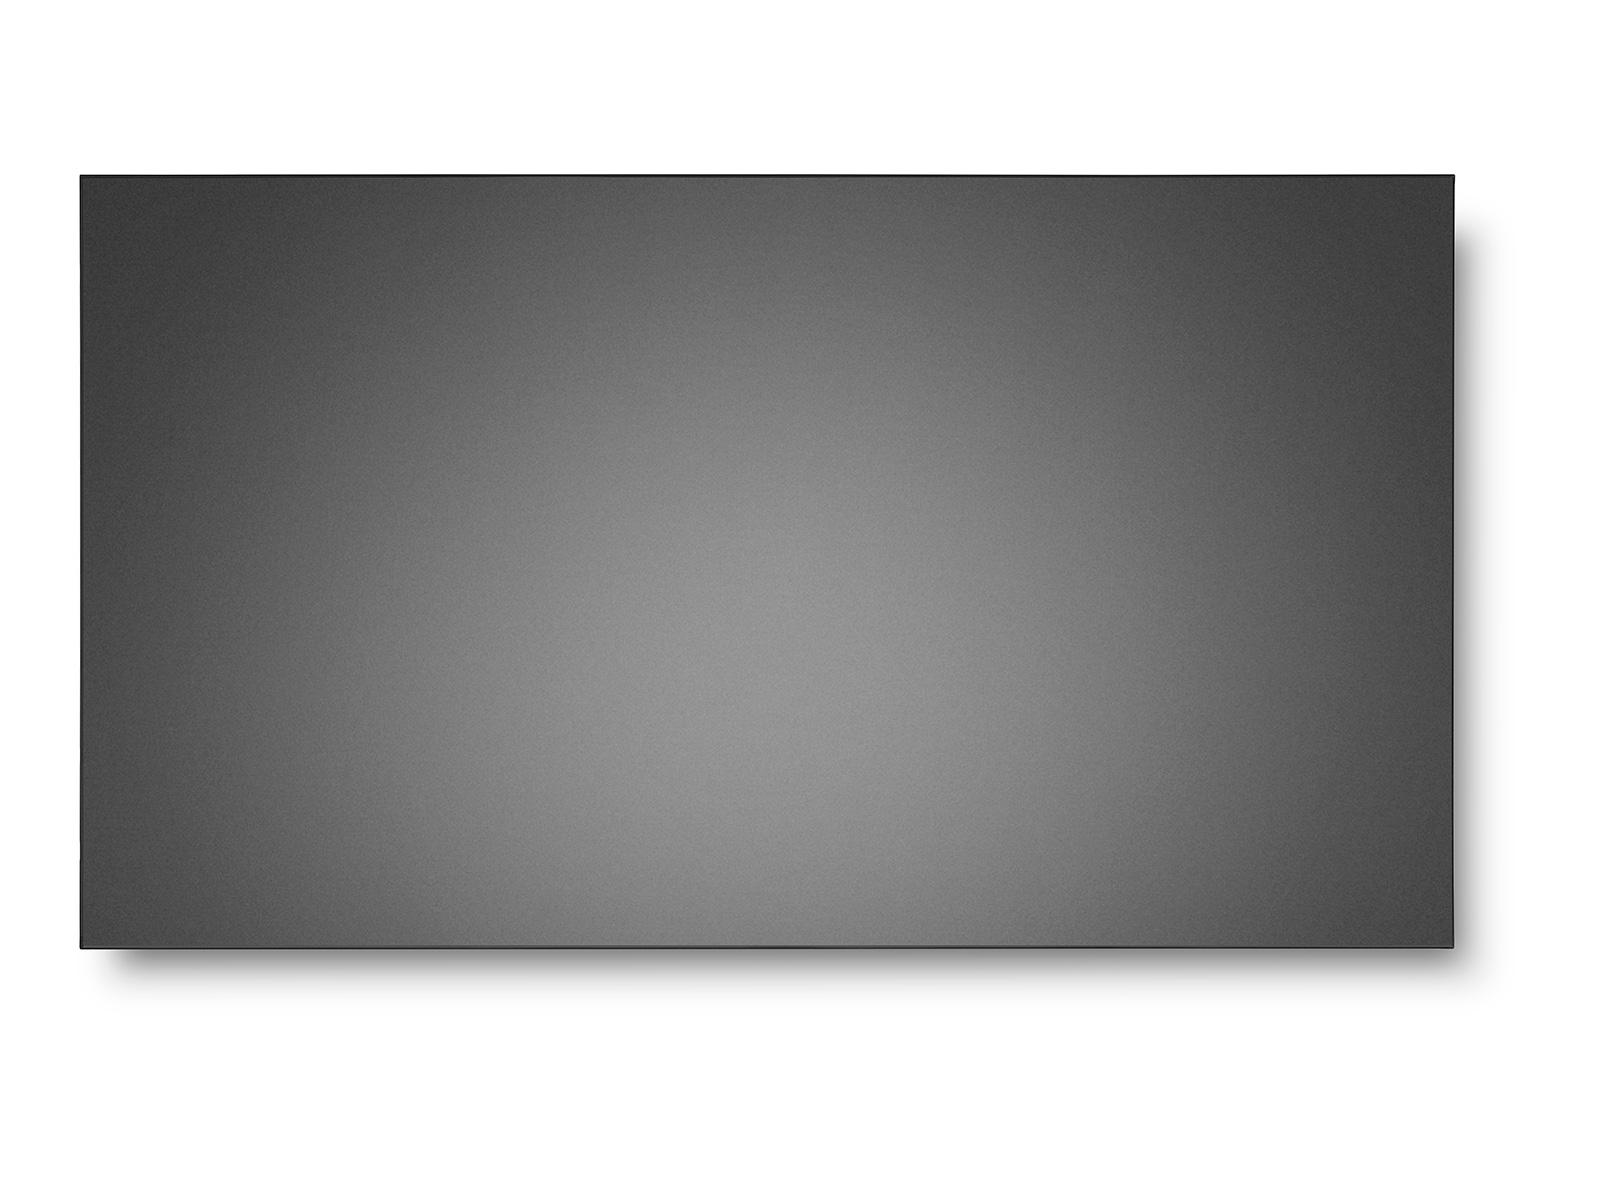 Televisions & Recorders NEC UN462VA UN Series 46in LCD Display